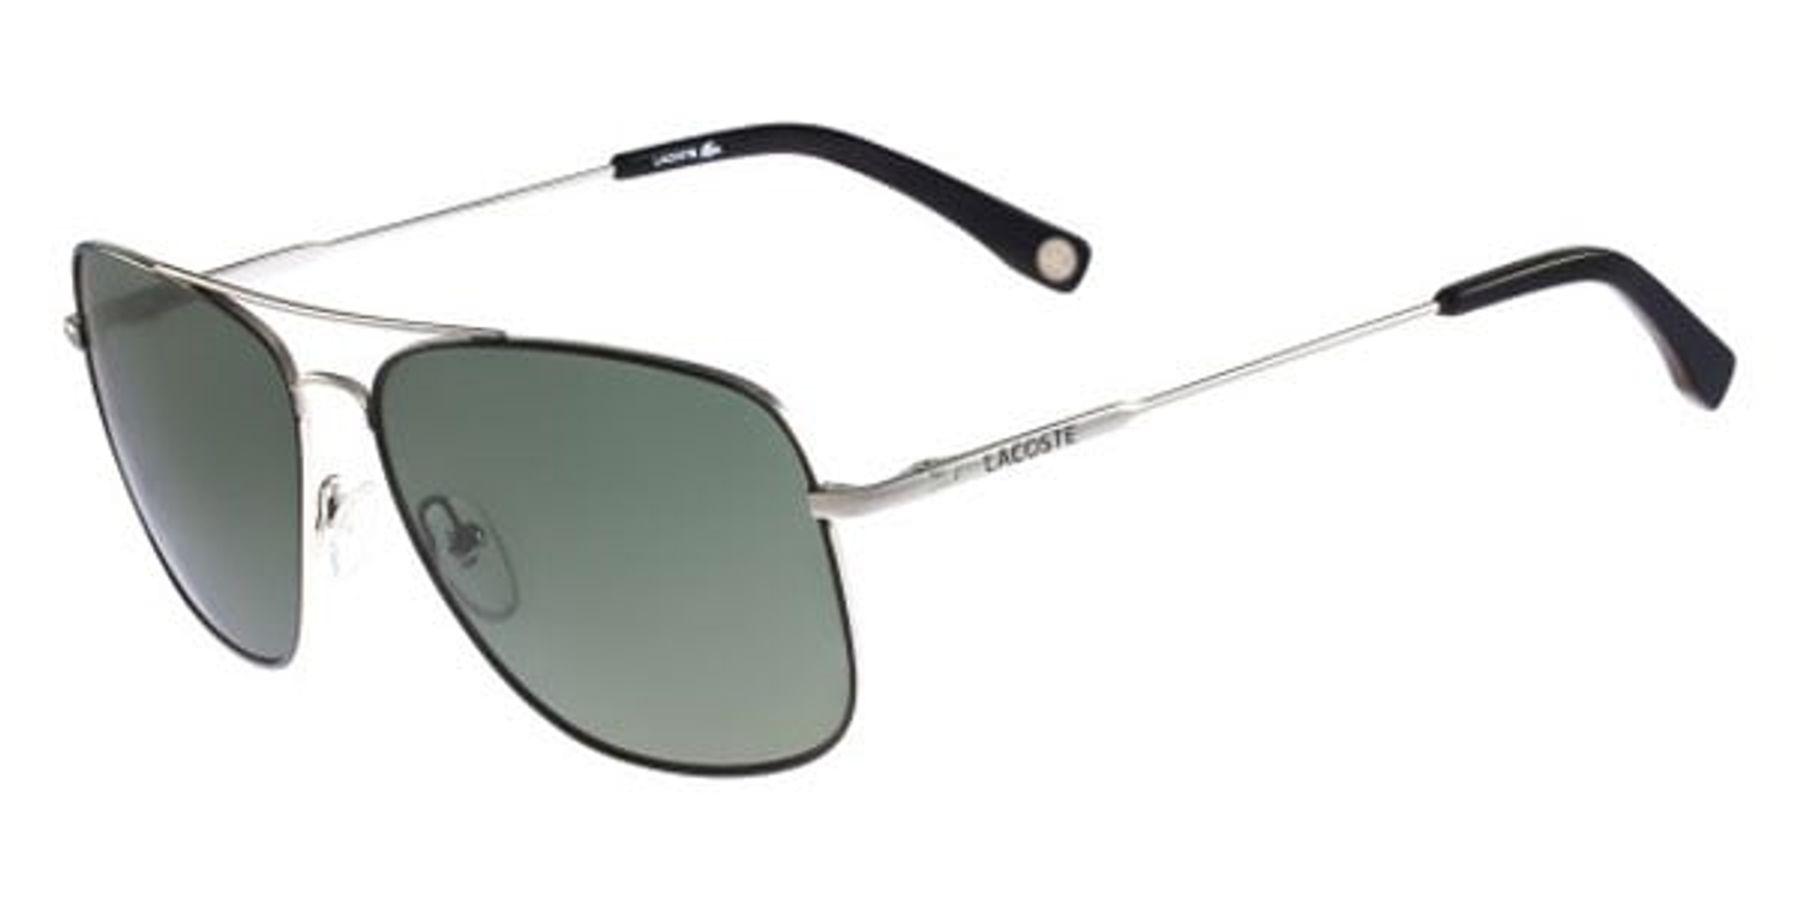 Mắt Kính Lacoste Sunglasses L175S 035 Grey Green